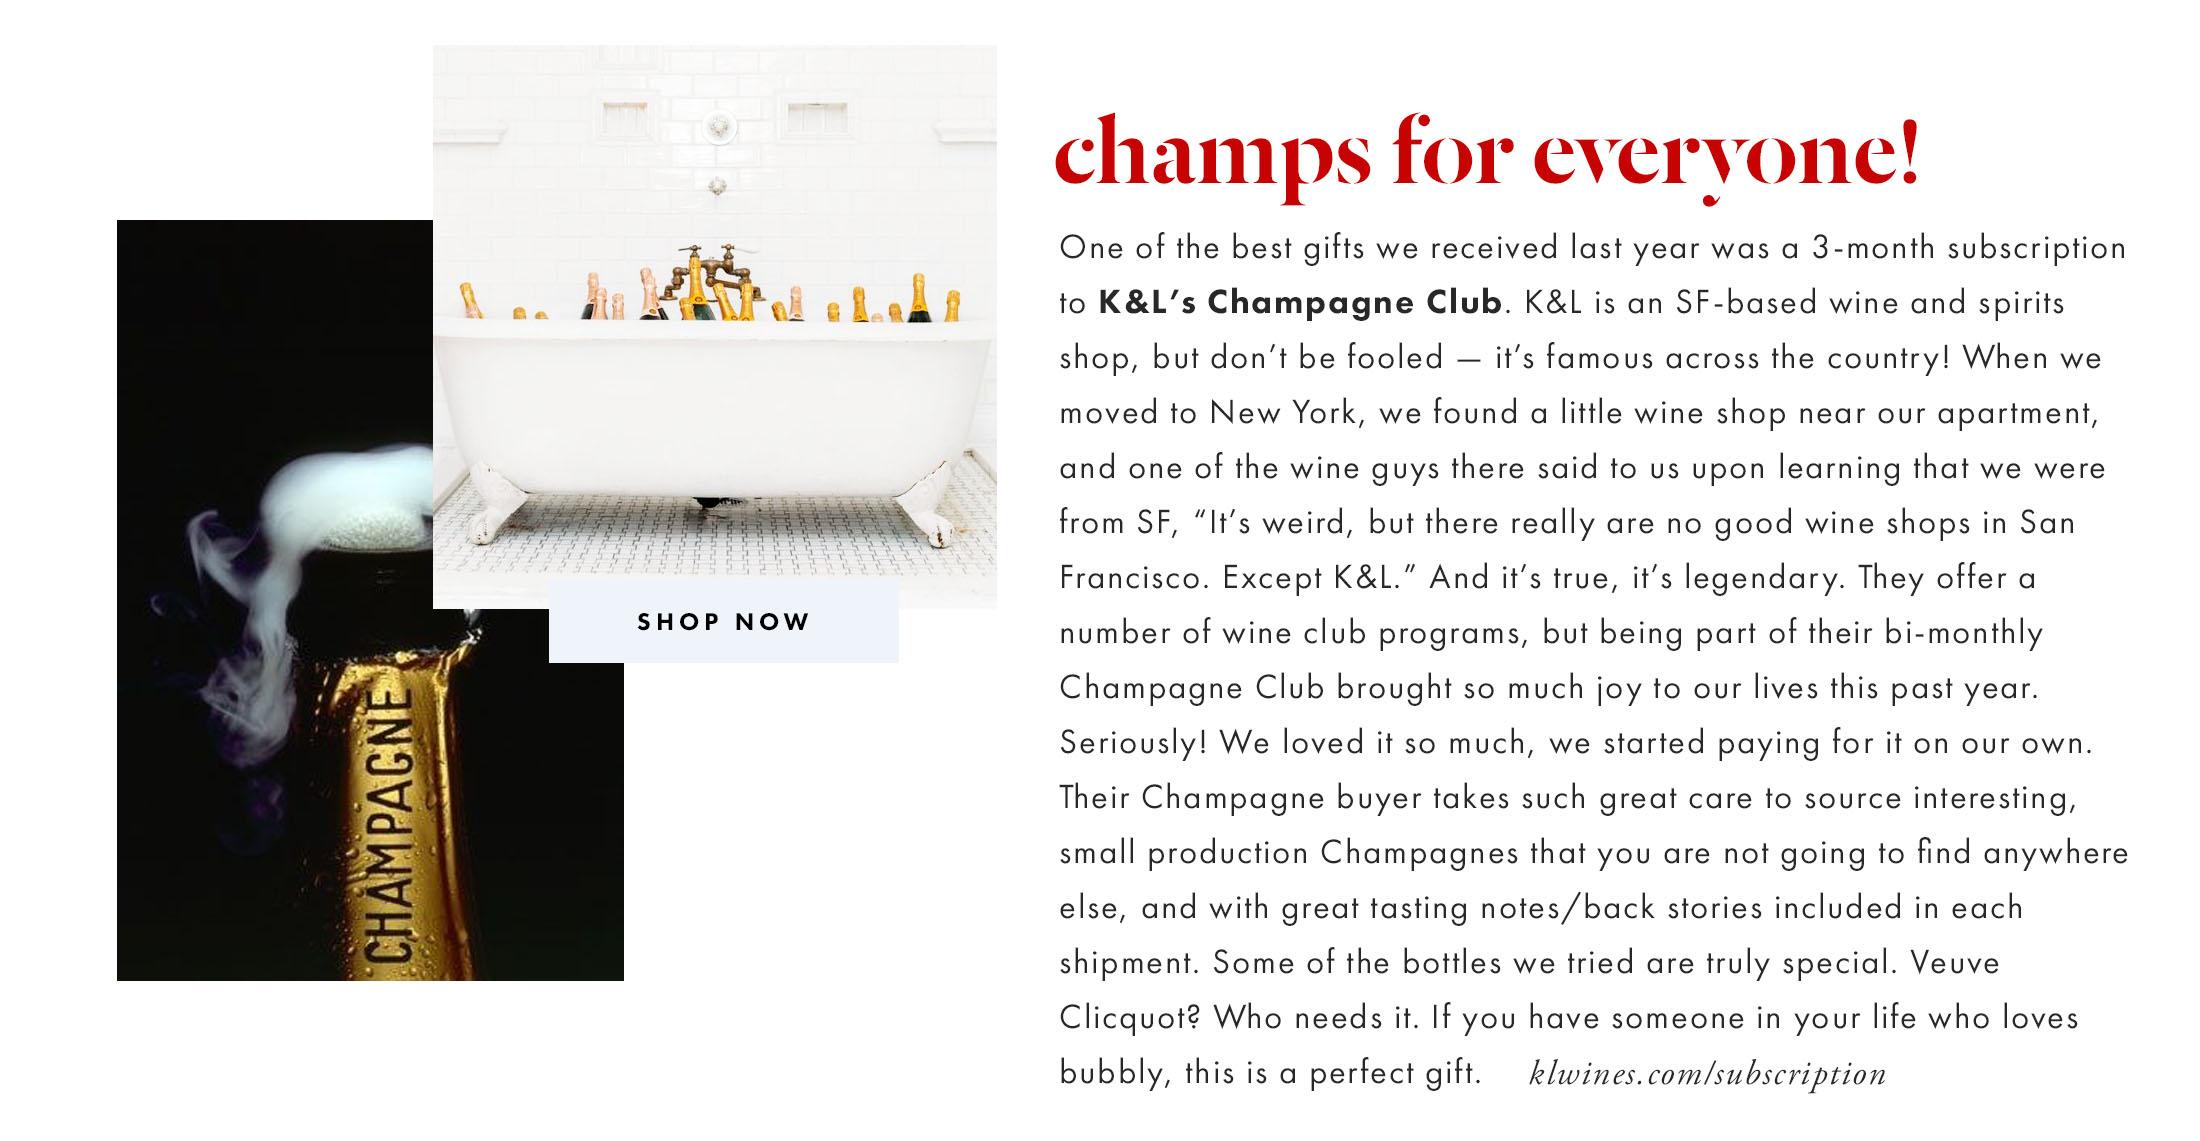 kl-champagne-club-gift-idea